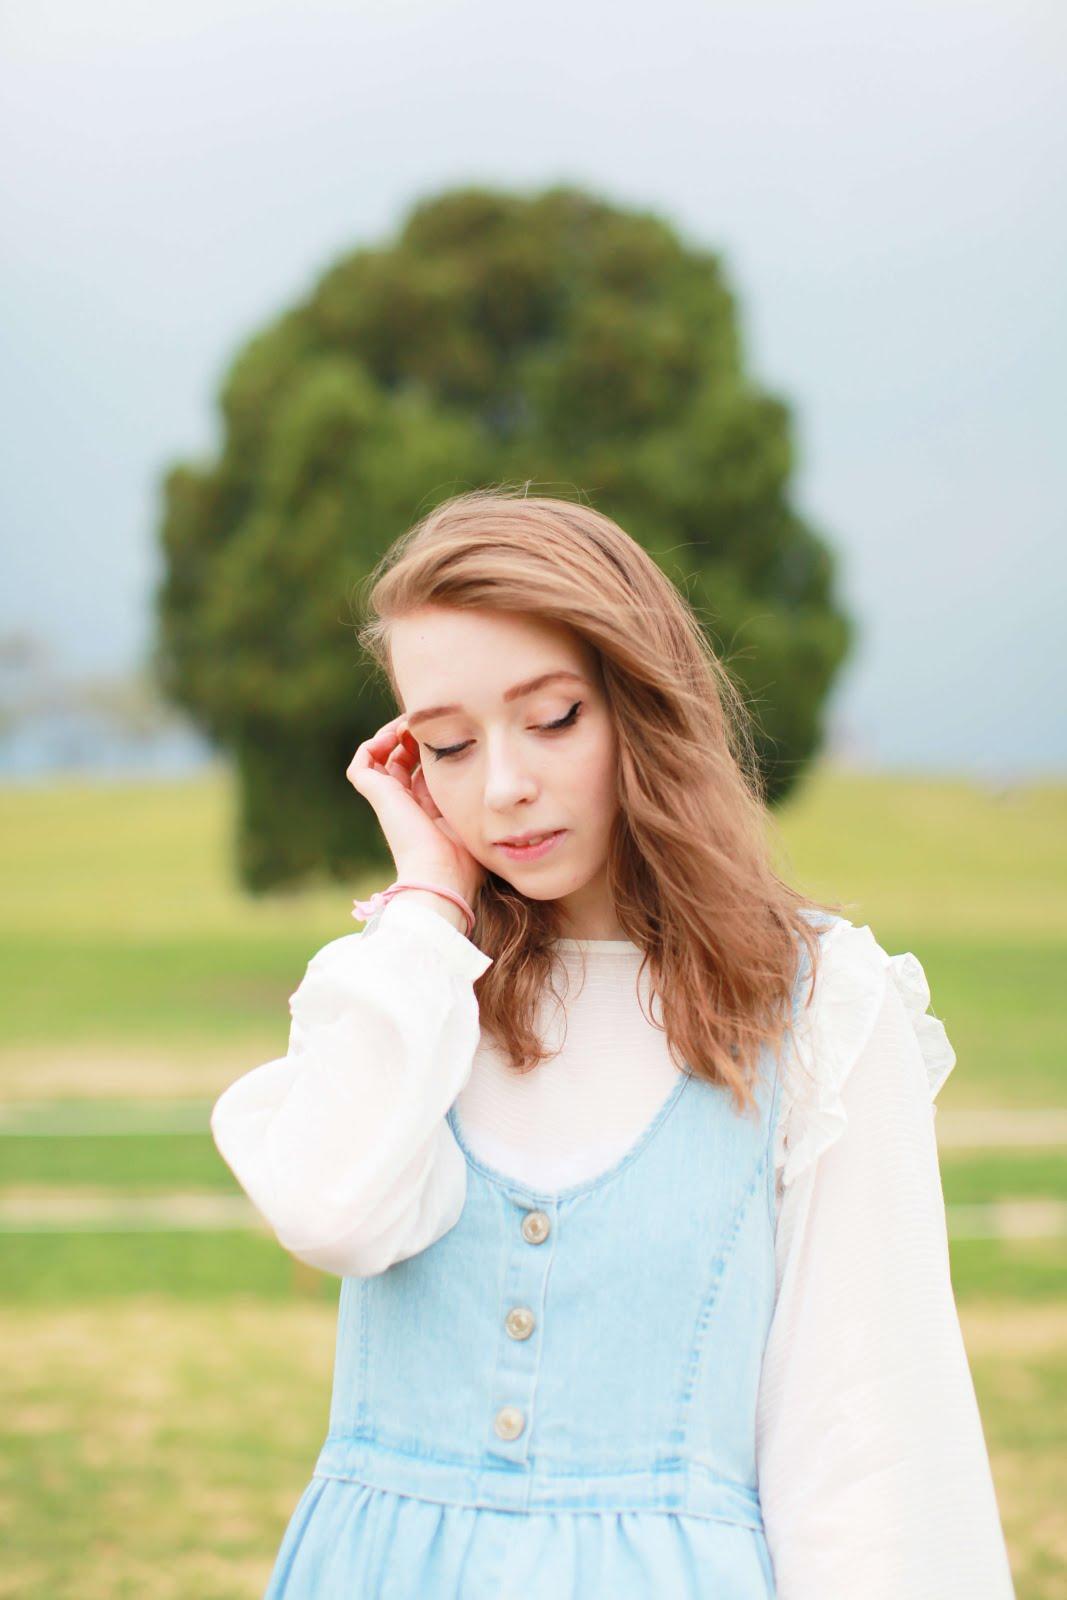 summer fashion outfit inspiration uk style blogger korean inspo kstyle